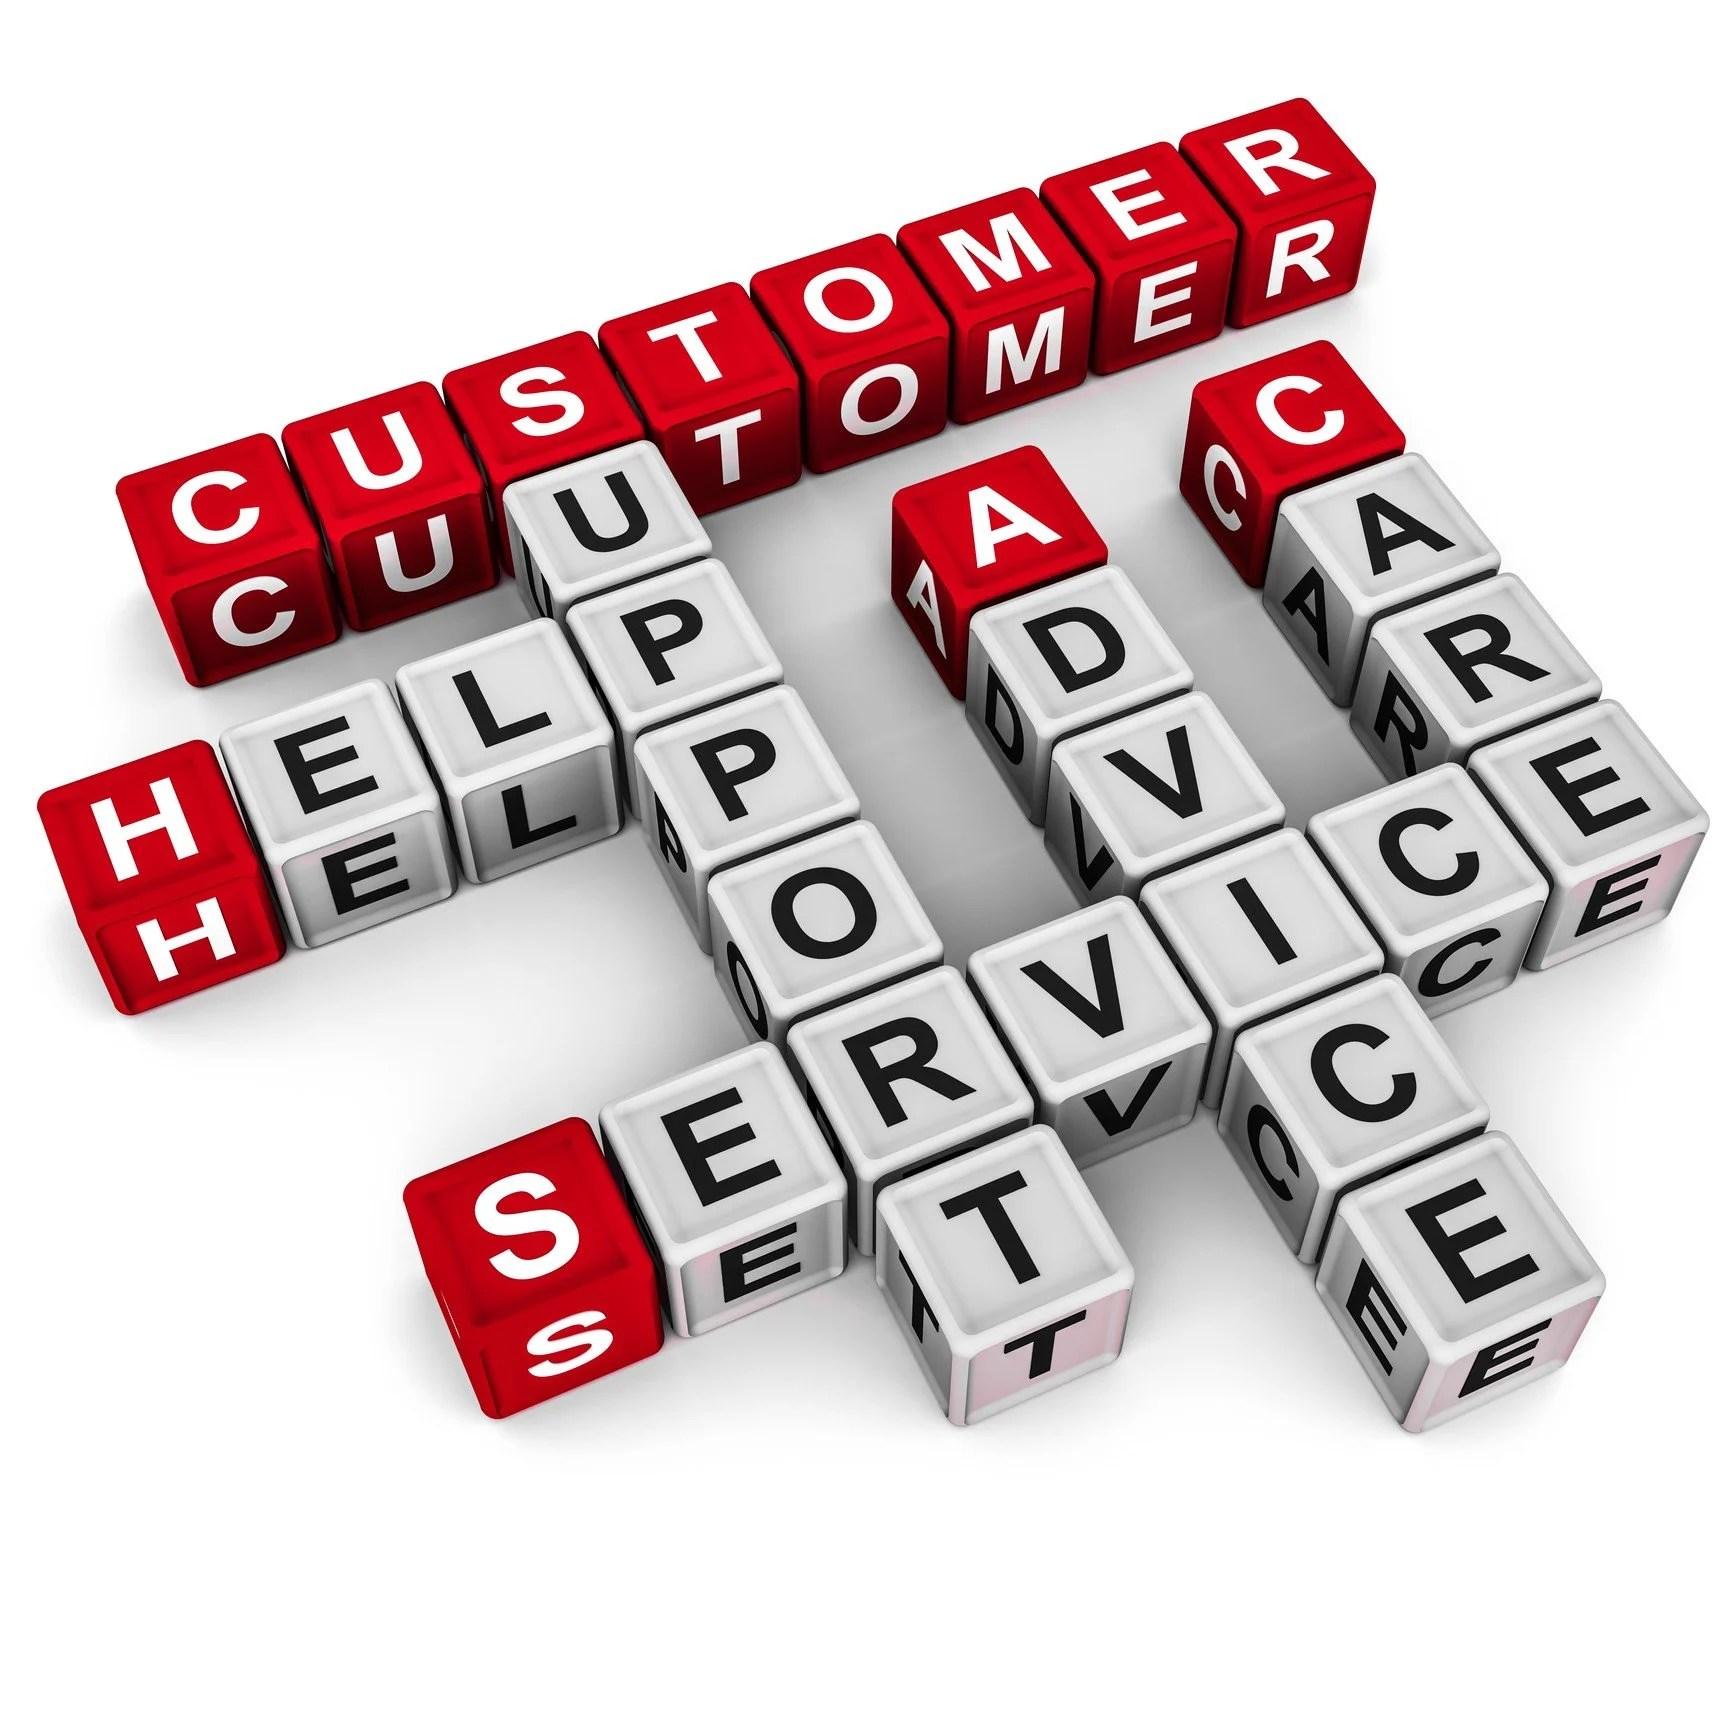 Customer service word blocks